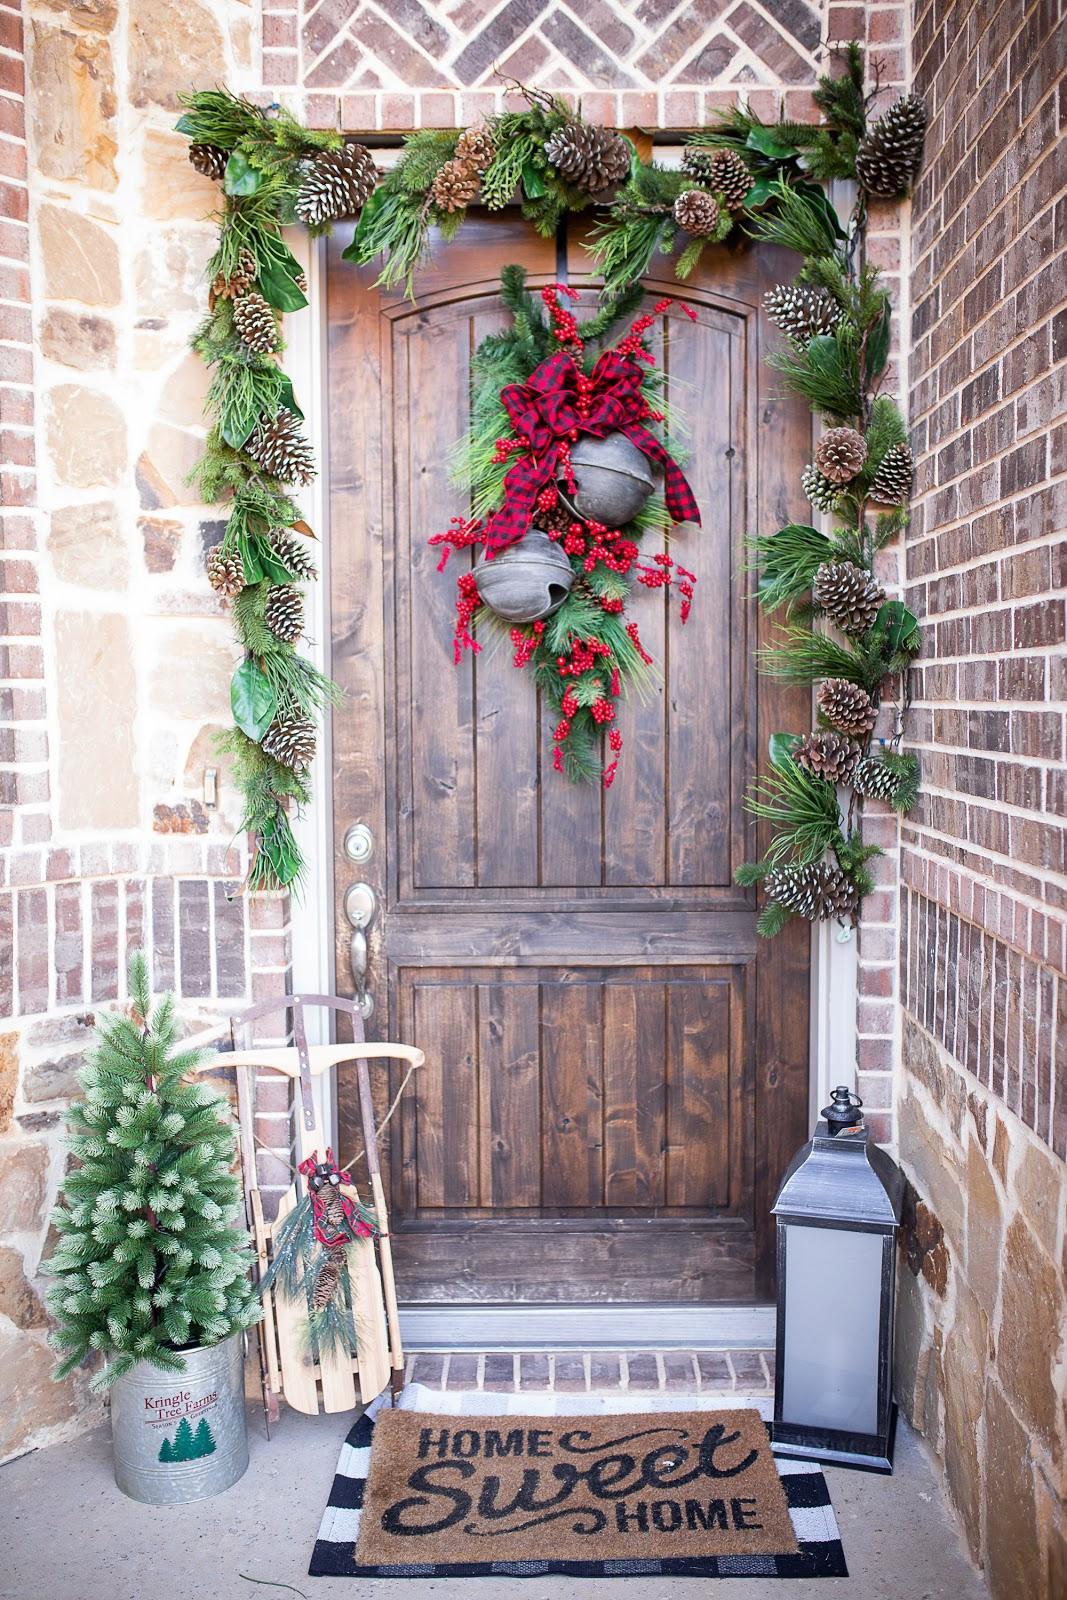 Christmas Decorating Trends 2020: Παραδοσιακός στολισμός στο σπίτι με κουκουνάρια, φύλλα ελάτων και κουδουνάκια